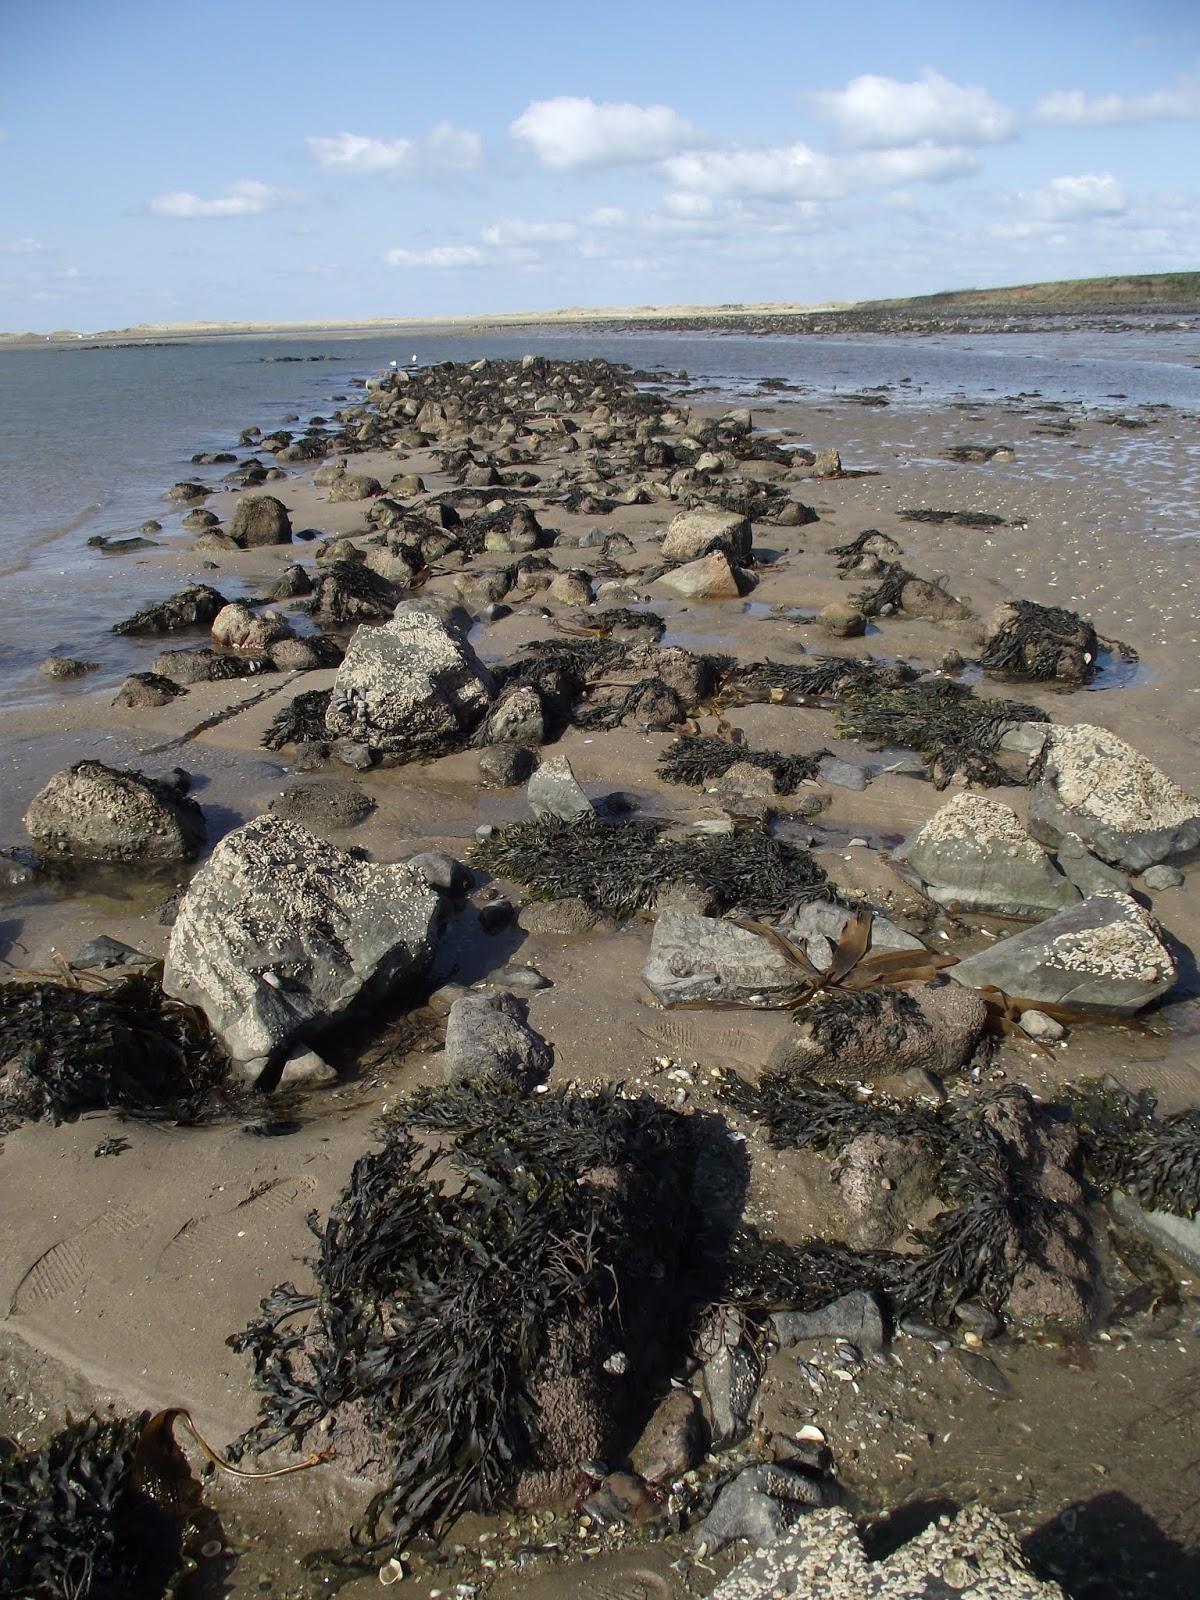 Outlandish Knight: Fish trap on Holy Island?